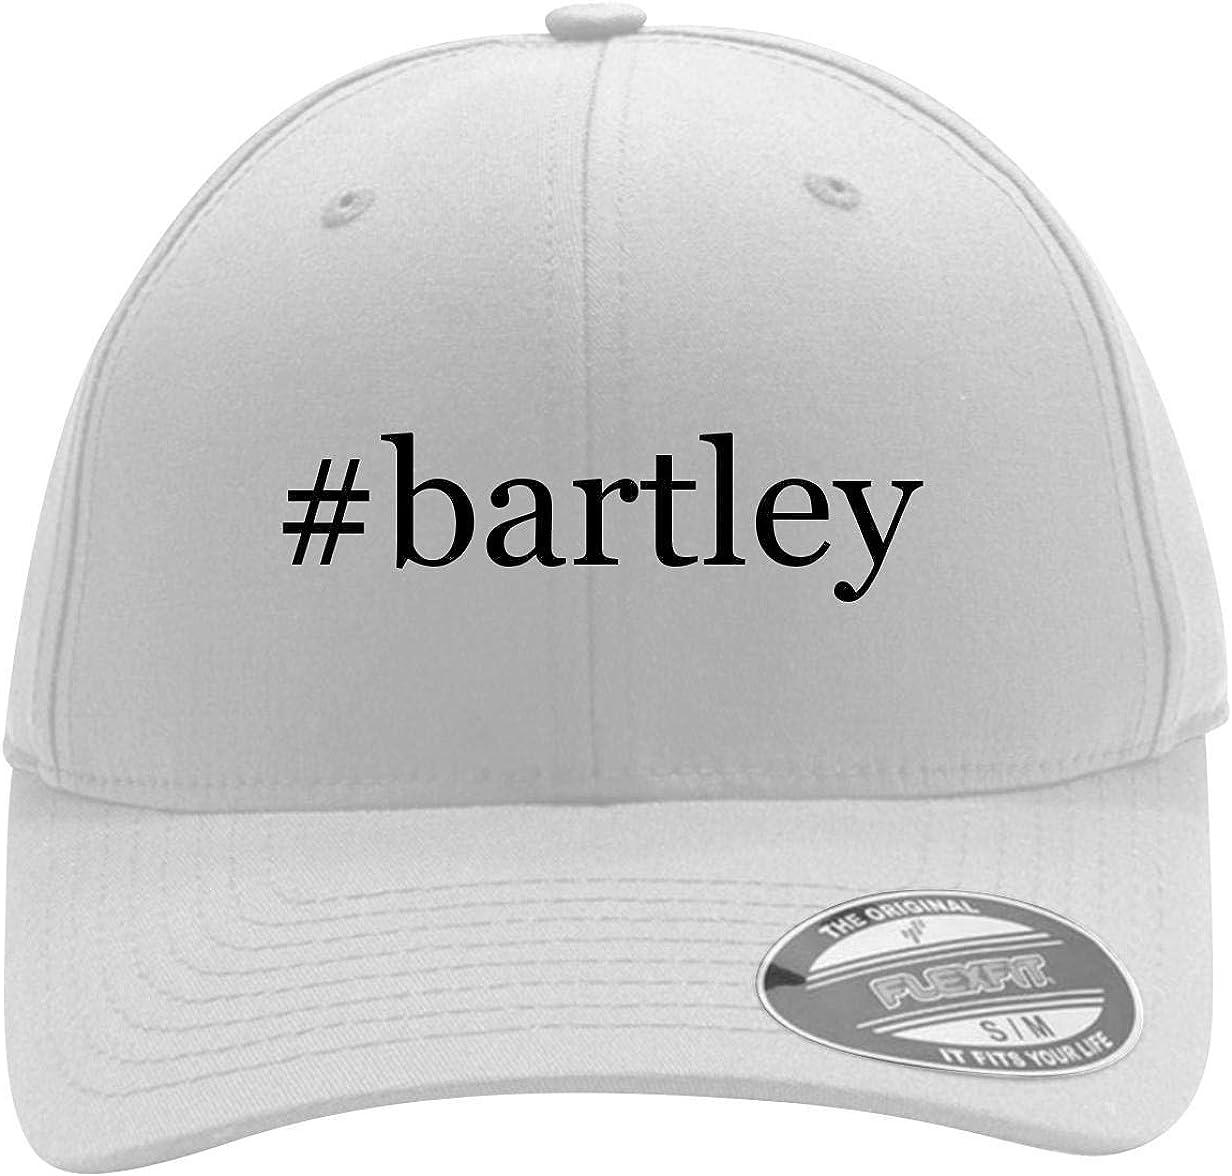 #Bartley - Men's Hashtag Flexfit Baseball Cap Hat